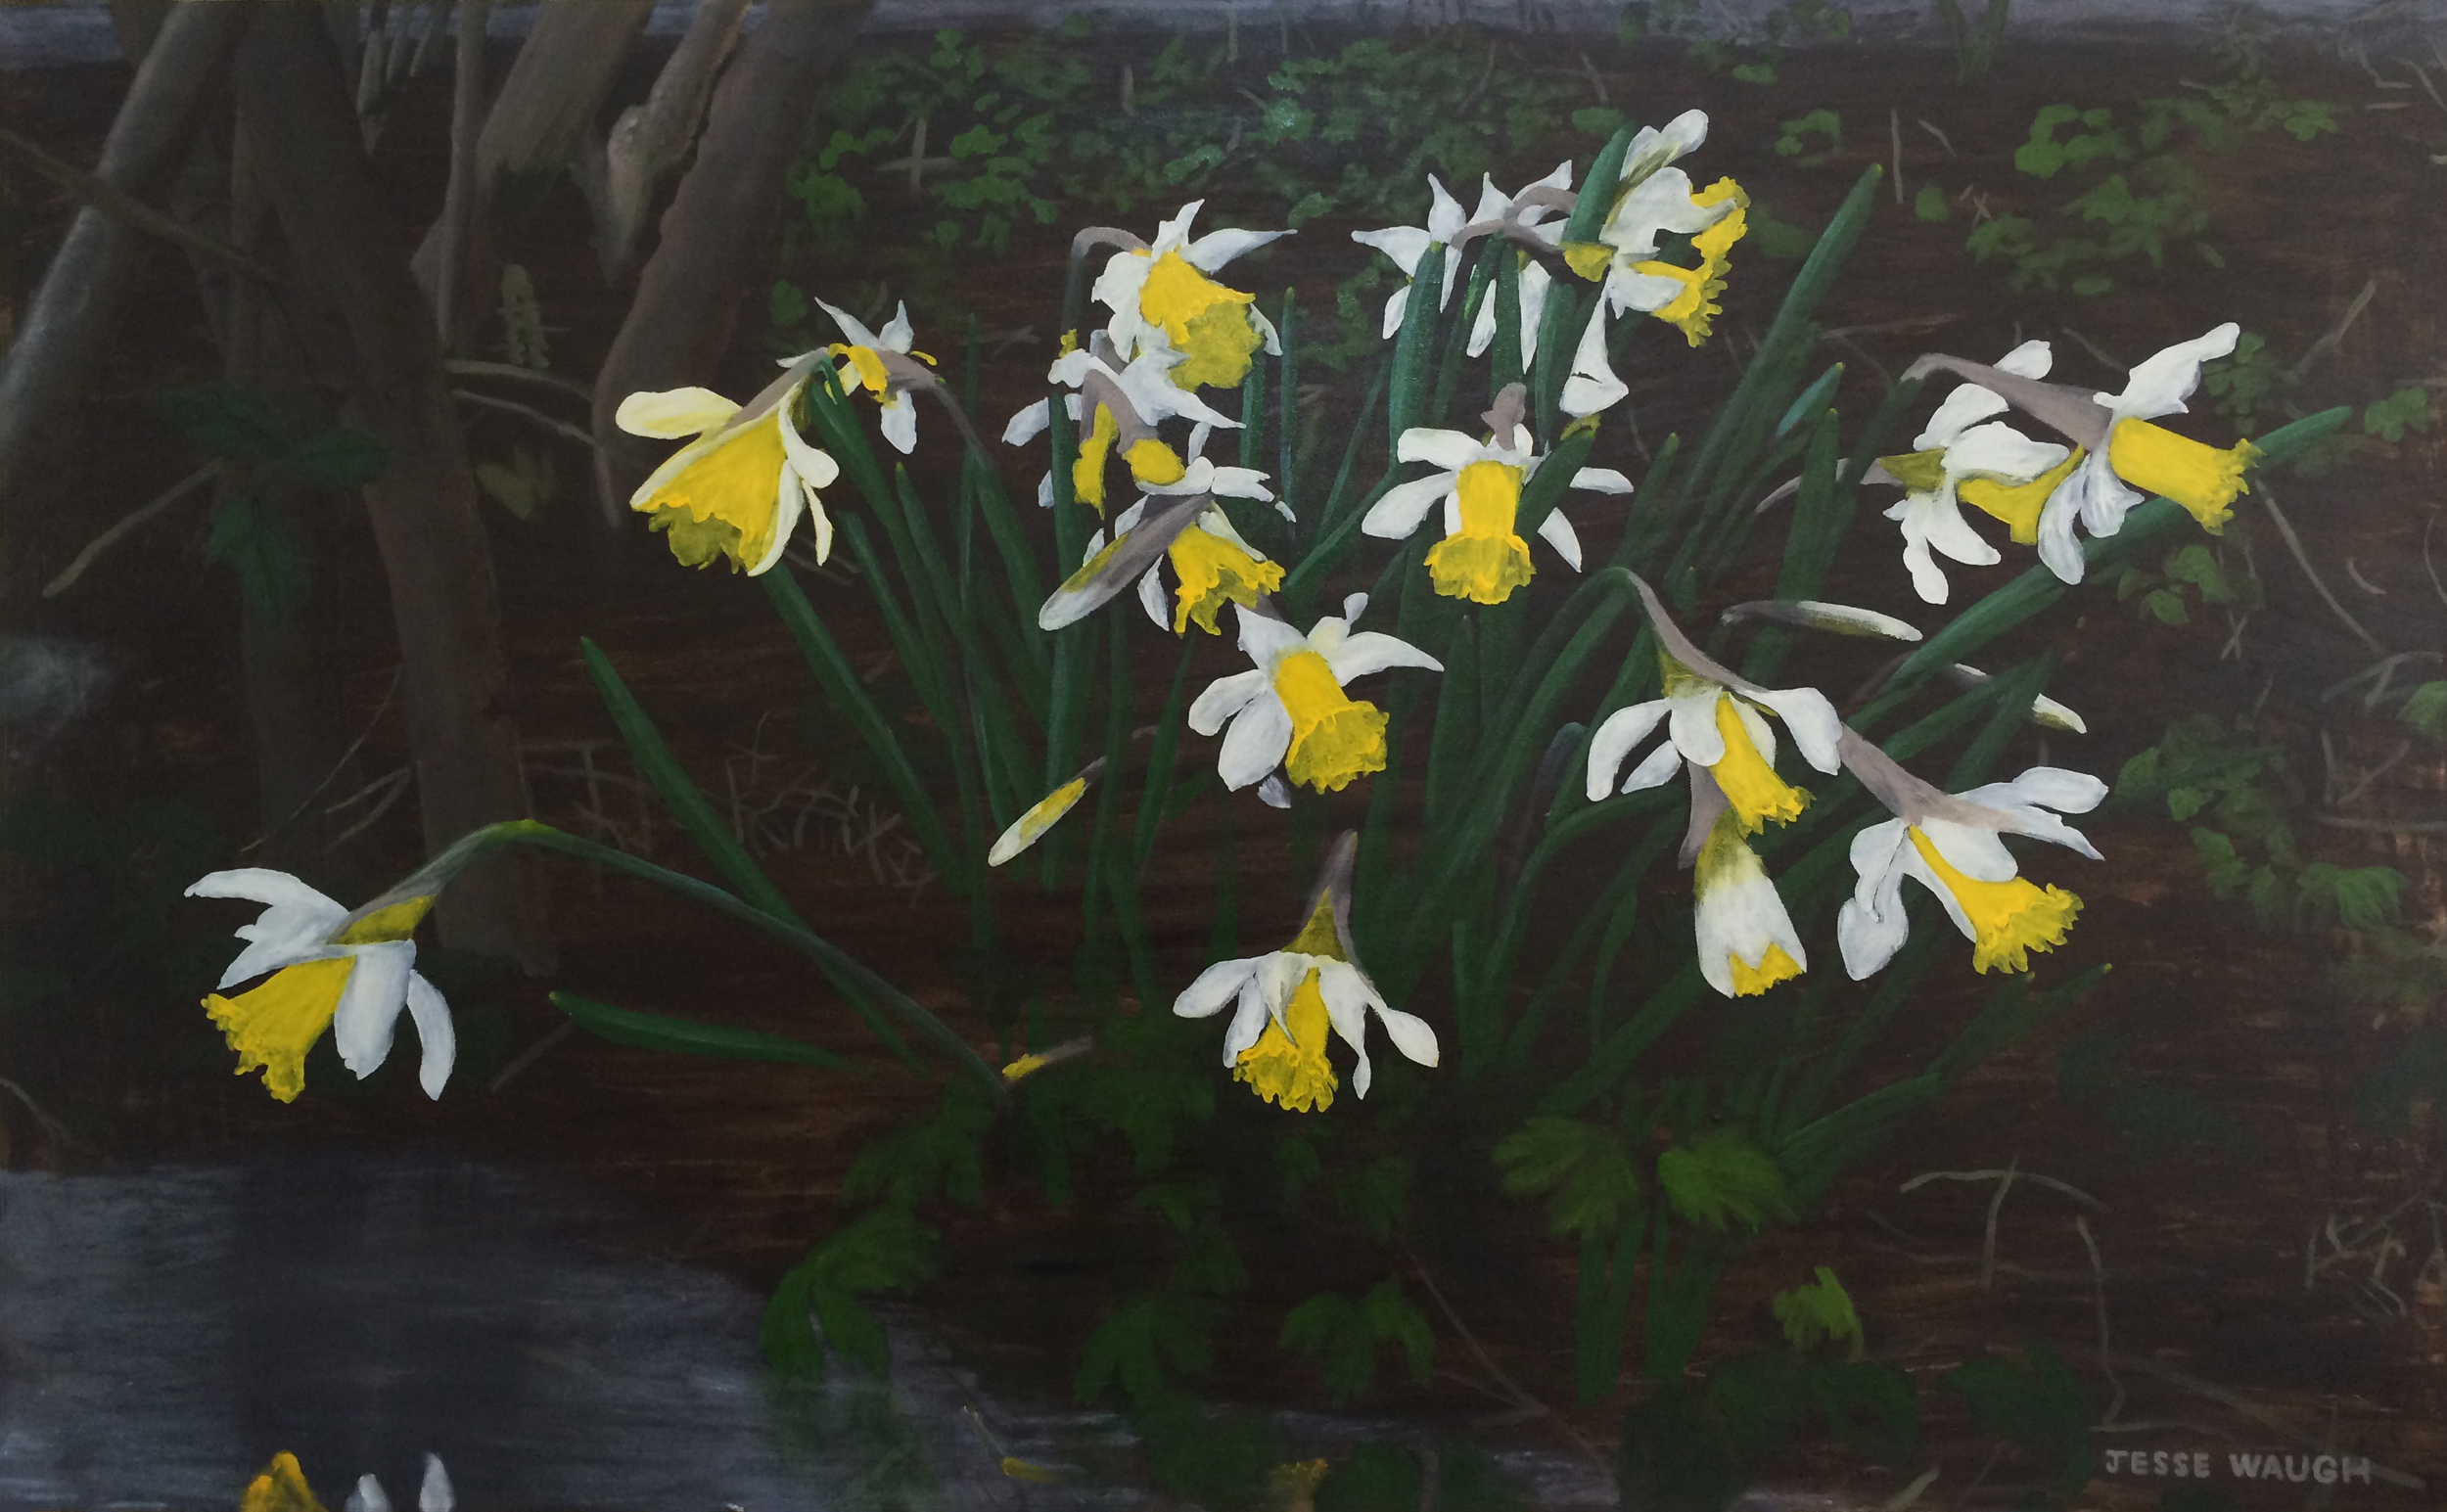 Jesse Waugh   Pseudonarcissus   2014 Oil on canvas